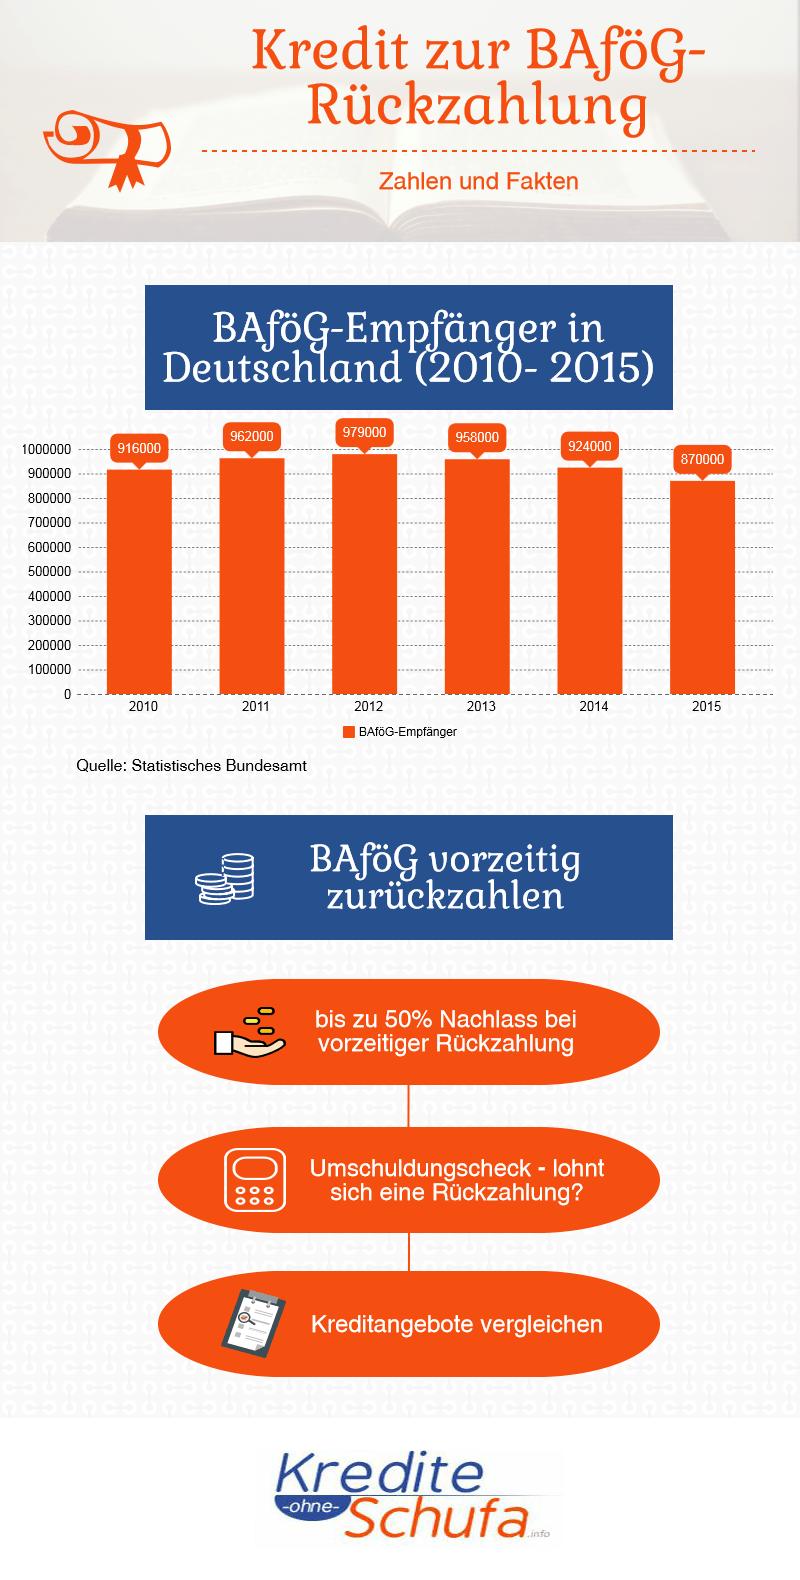 Infografik zur BAföG-Rückzahlung